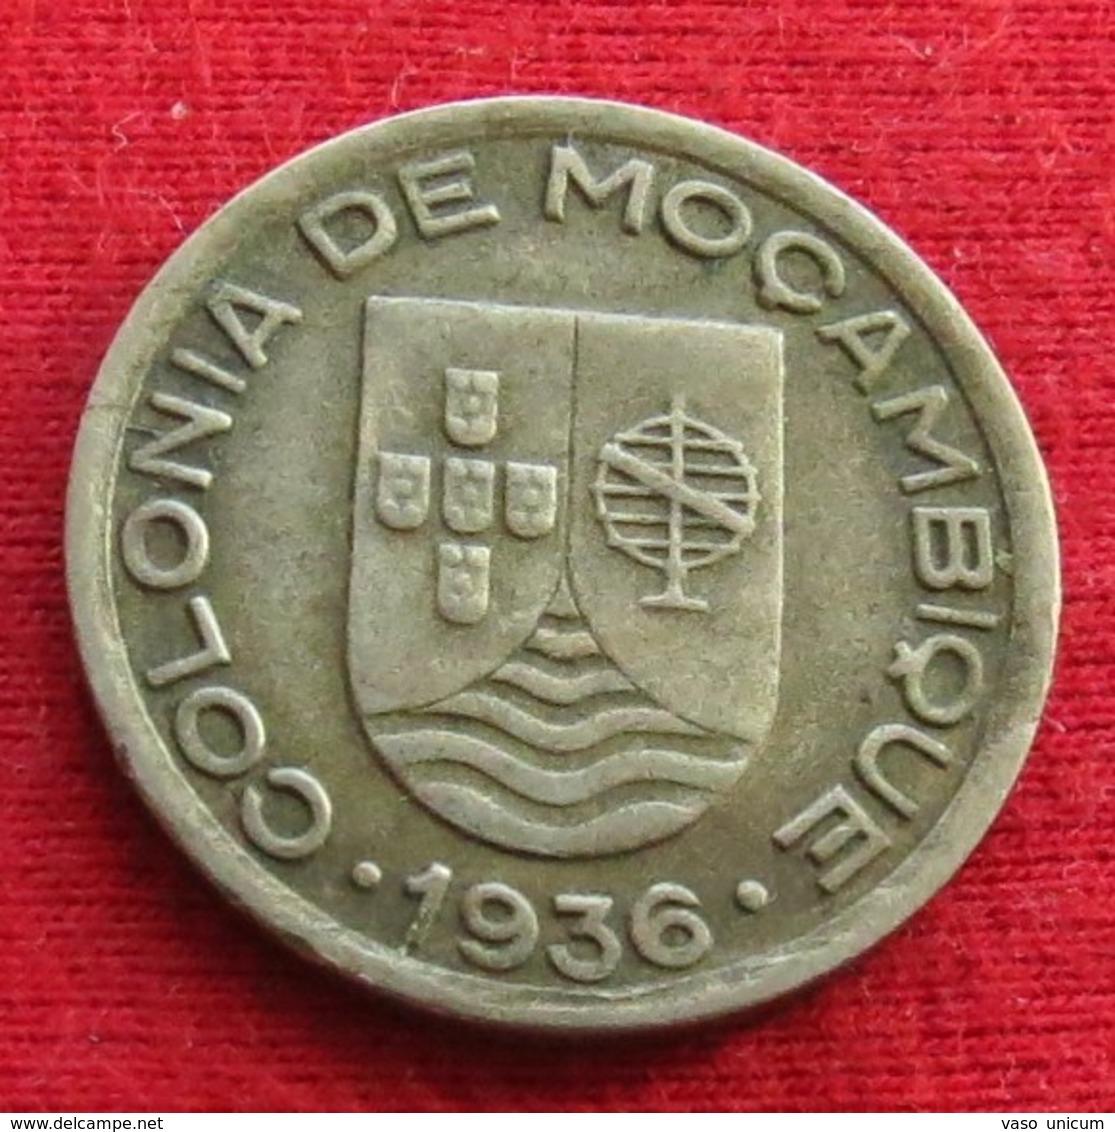 Mozambique 50 Centavos 1936 Mozambico Moçambique - Mozambique